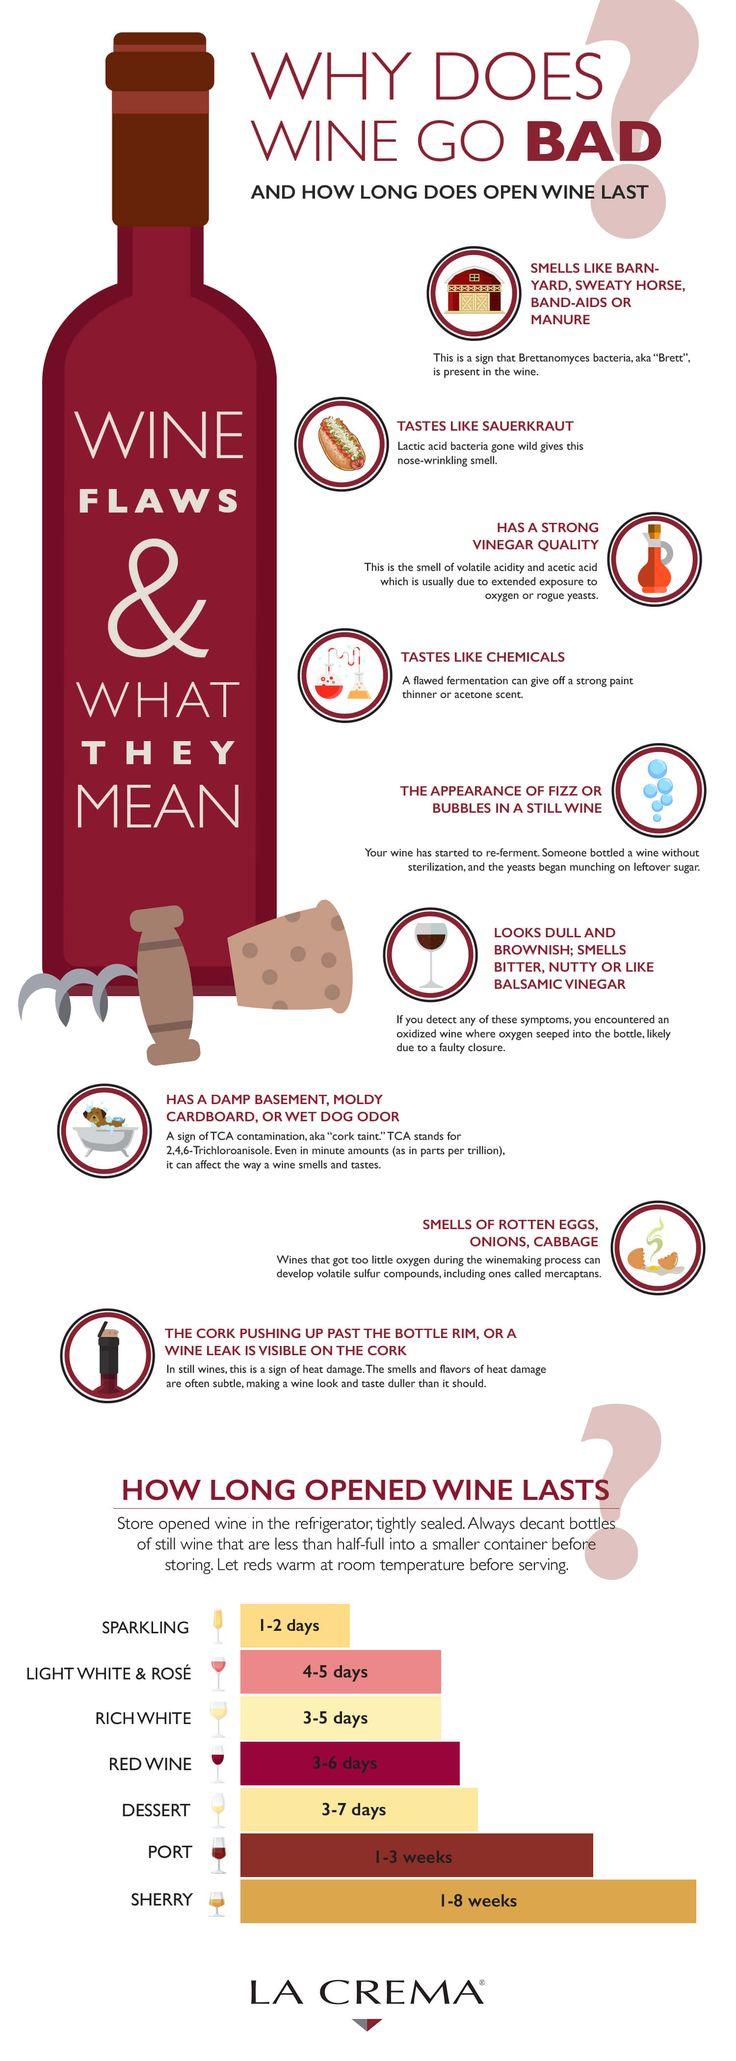 Why Does Wine Go Bad | LaCrema.com